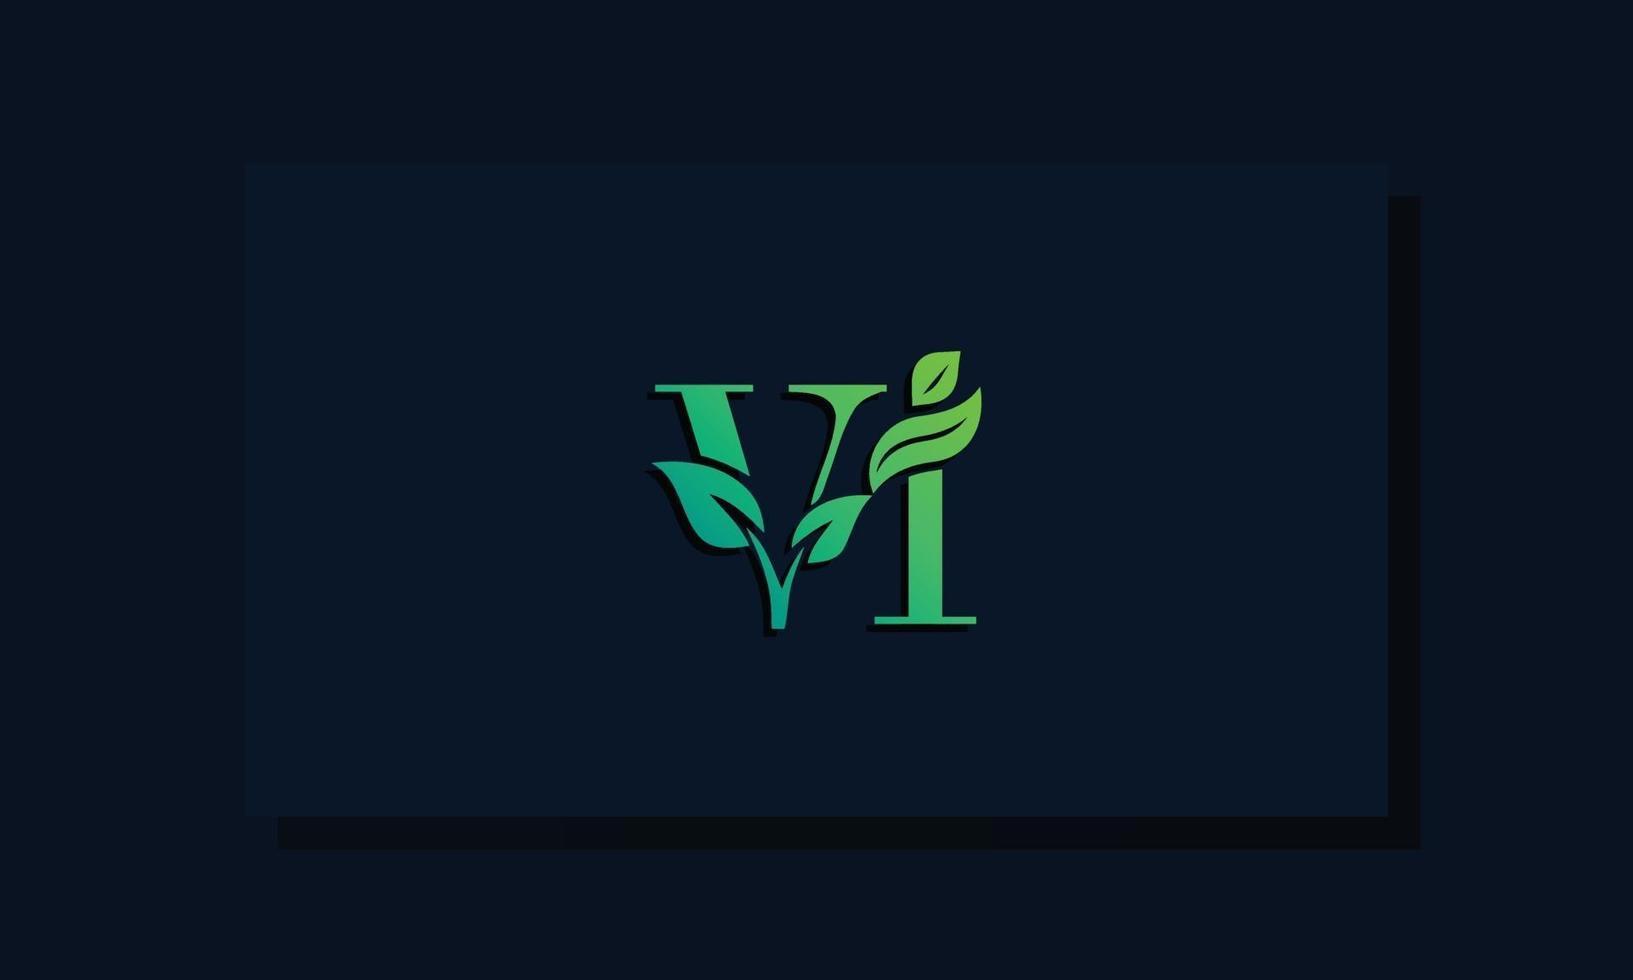 Minimal leaf style Initial VI logo vector